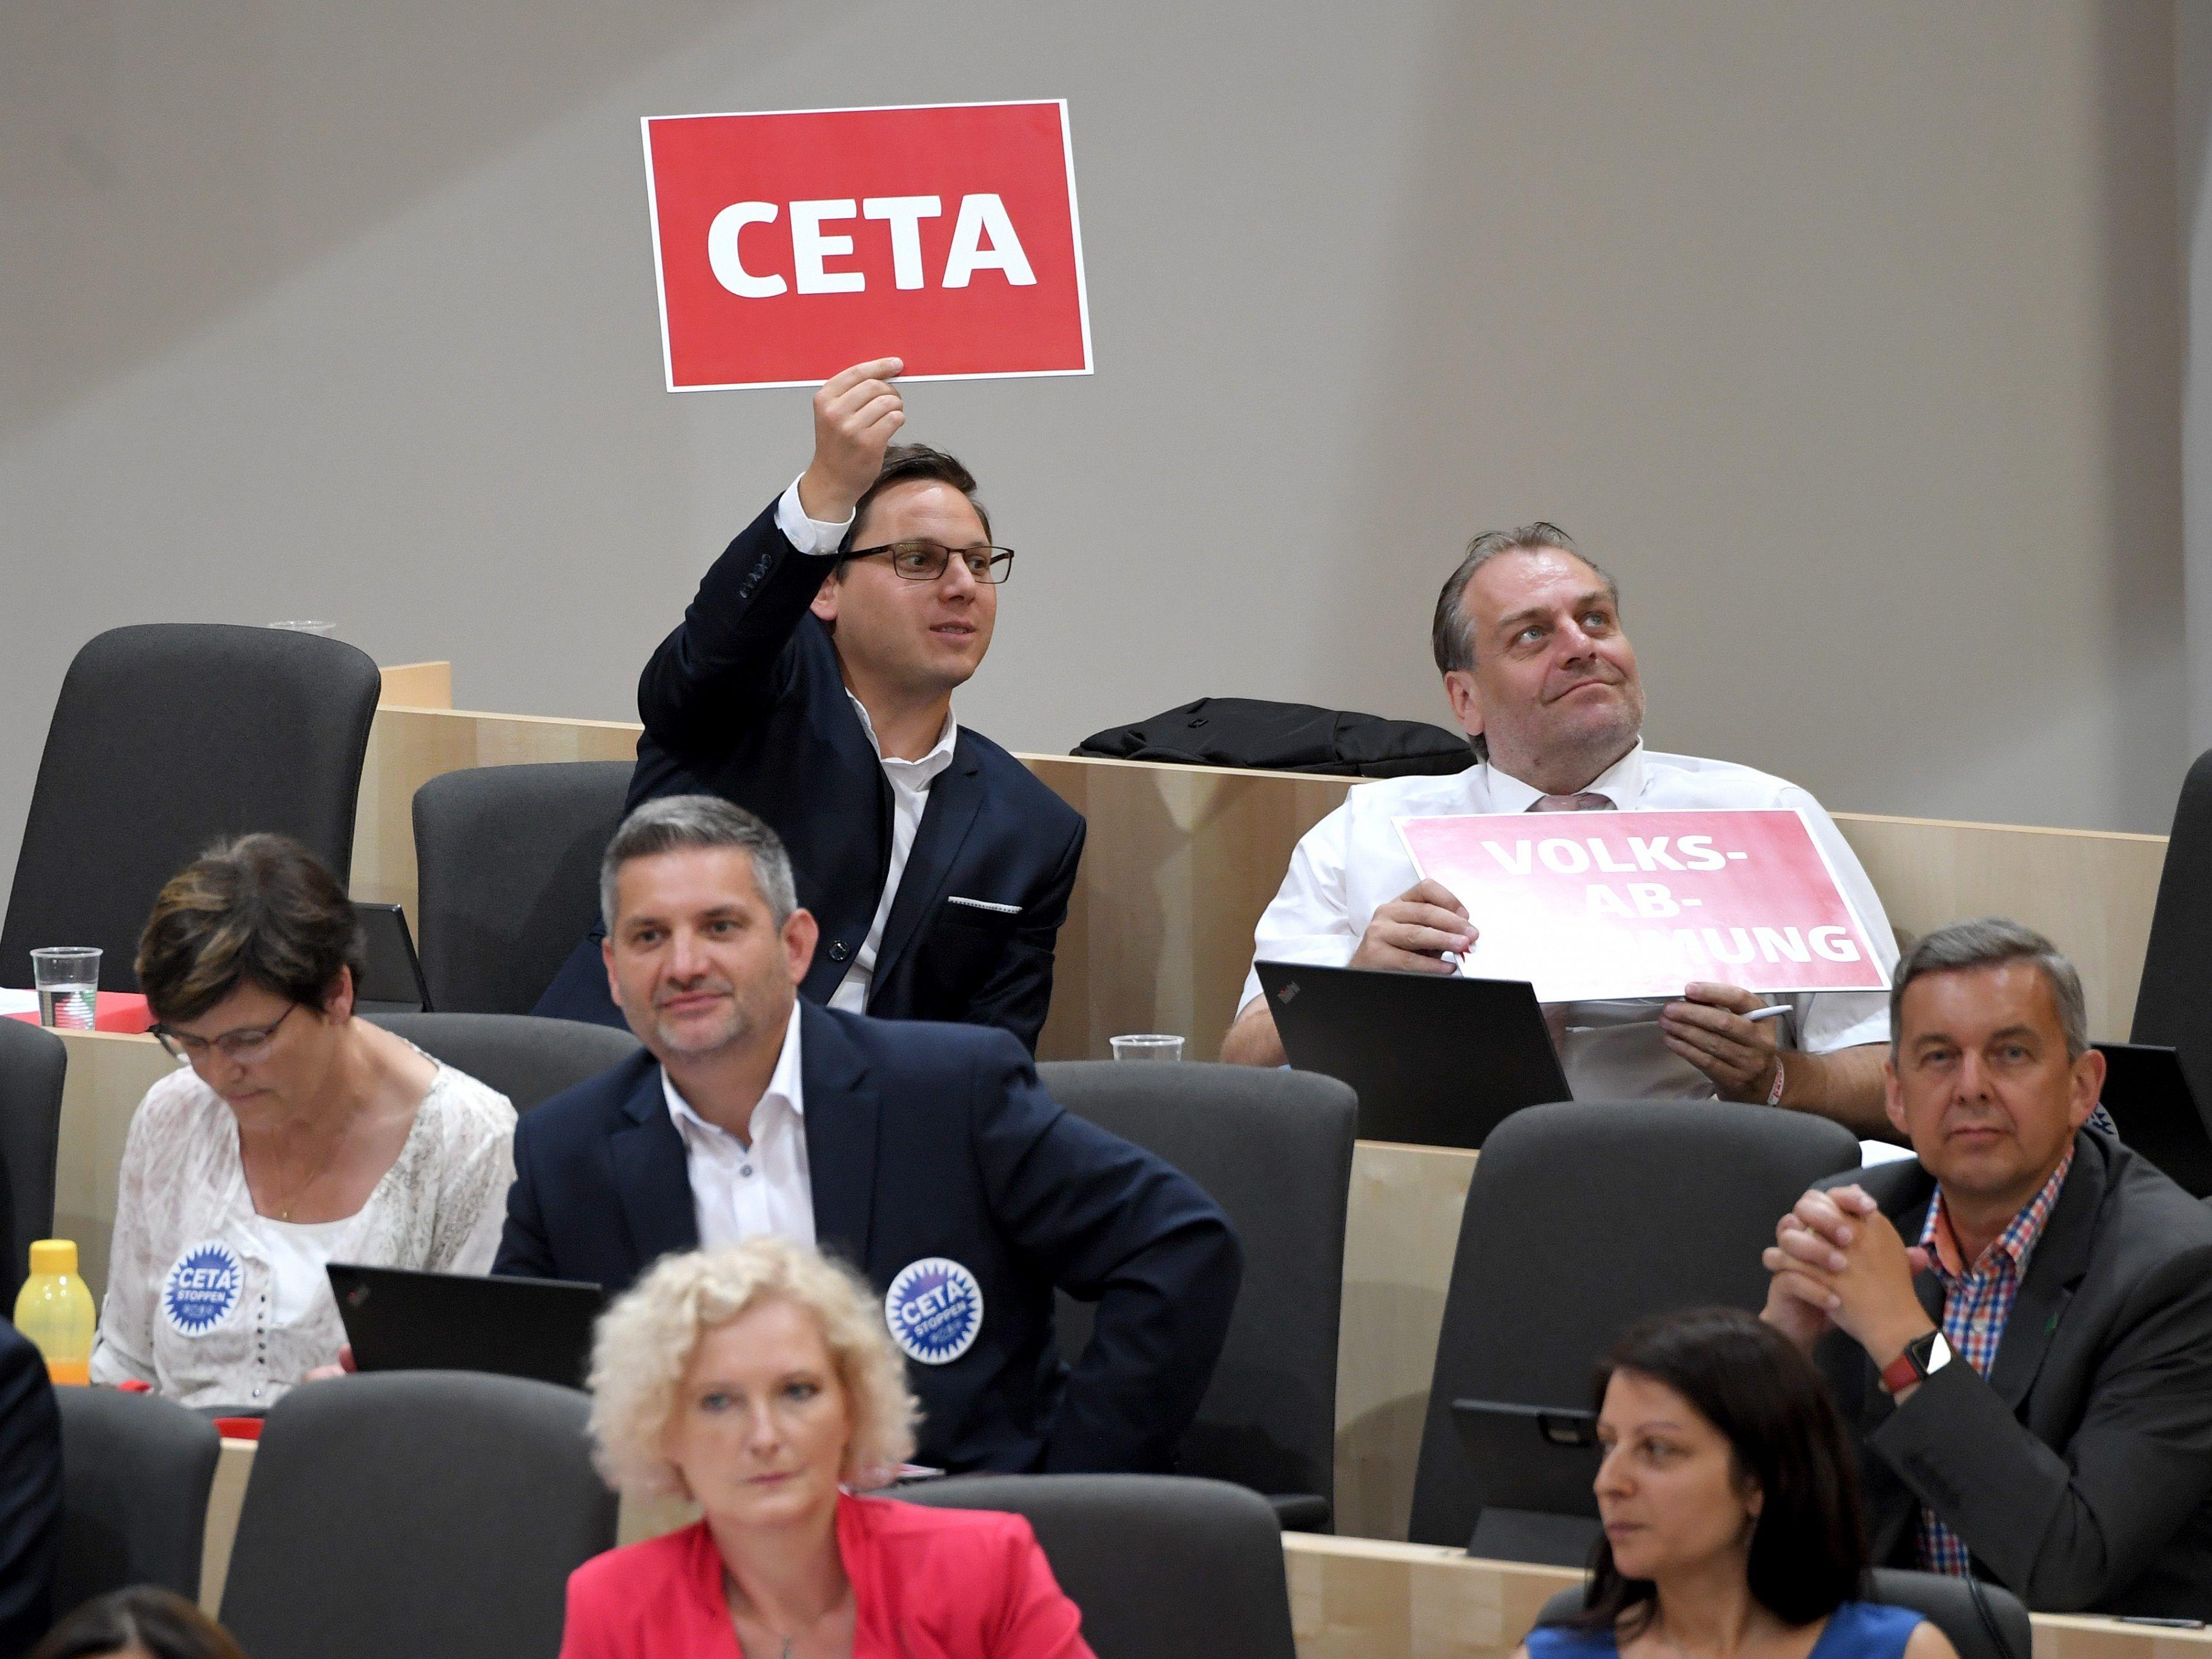 EuGH zu EU-Kanada-Handelspakt: Ceta-Schiedsgerichte mit EU-Recht vereinbar